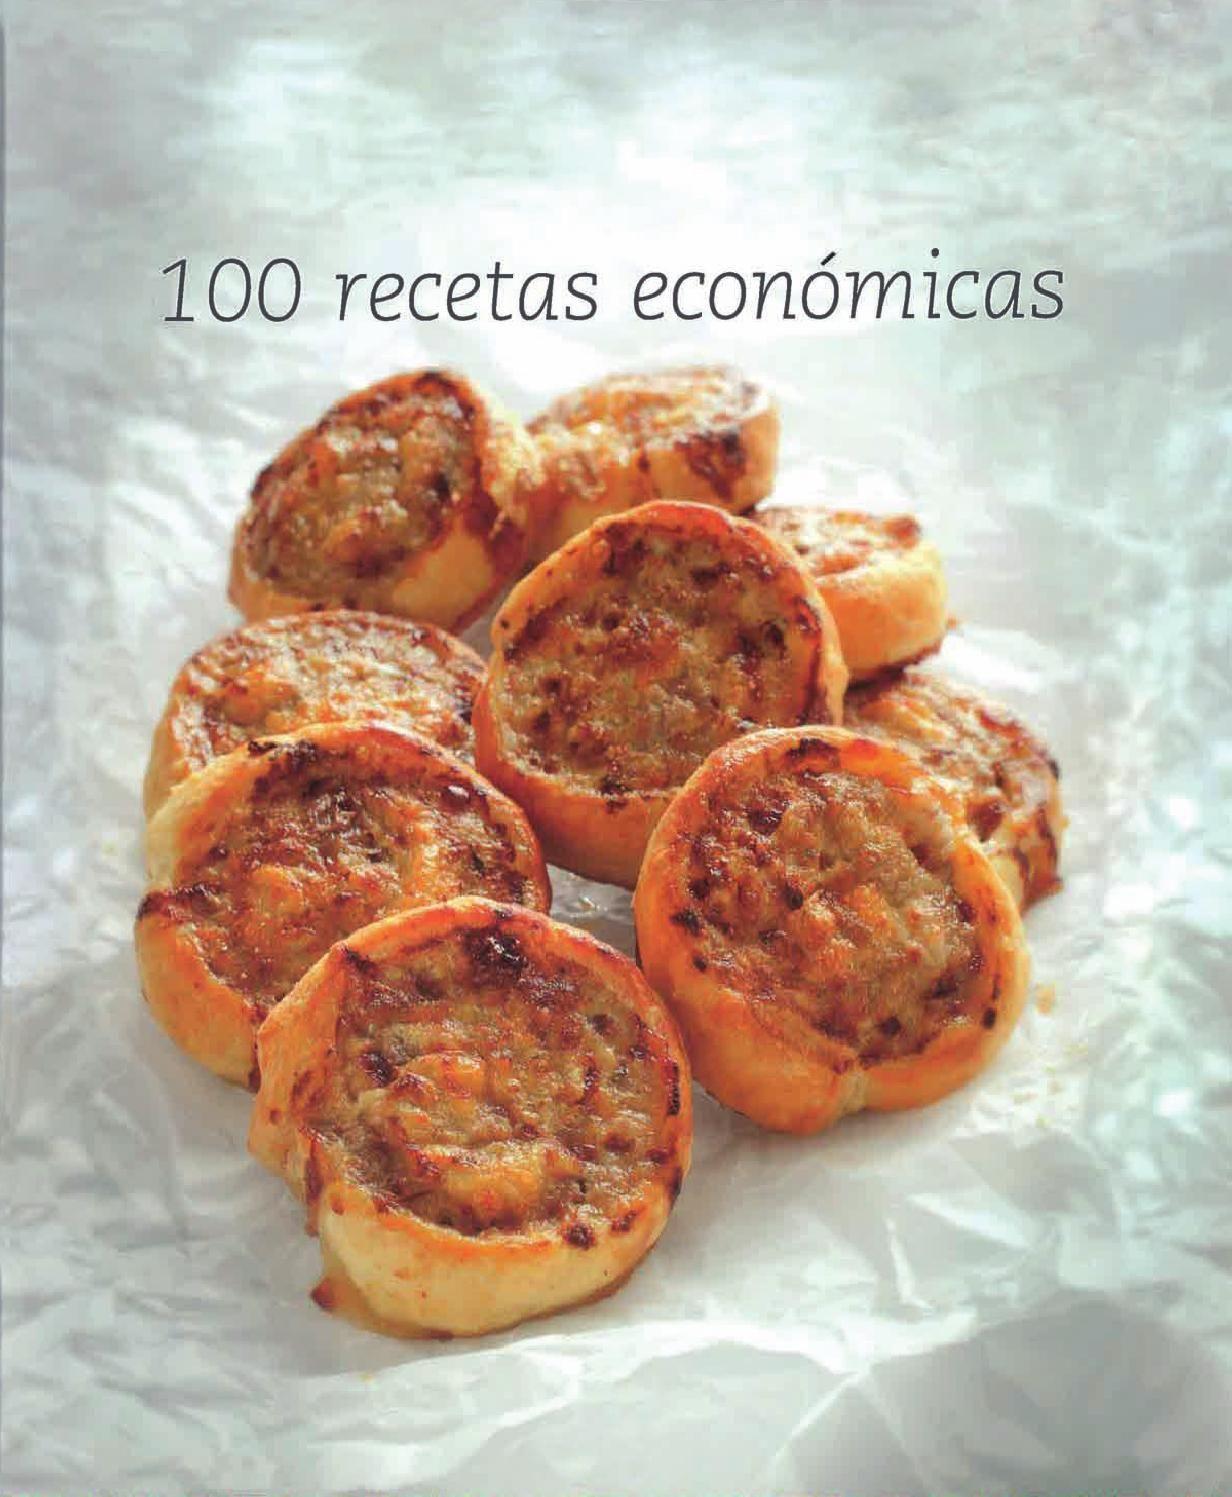 100 recetas economicas thermomix livres recettes pinterest thermomix recetas y cooking - Cuisine 100 facons thermomix ...